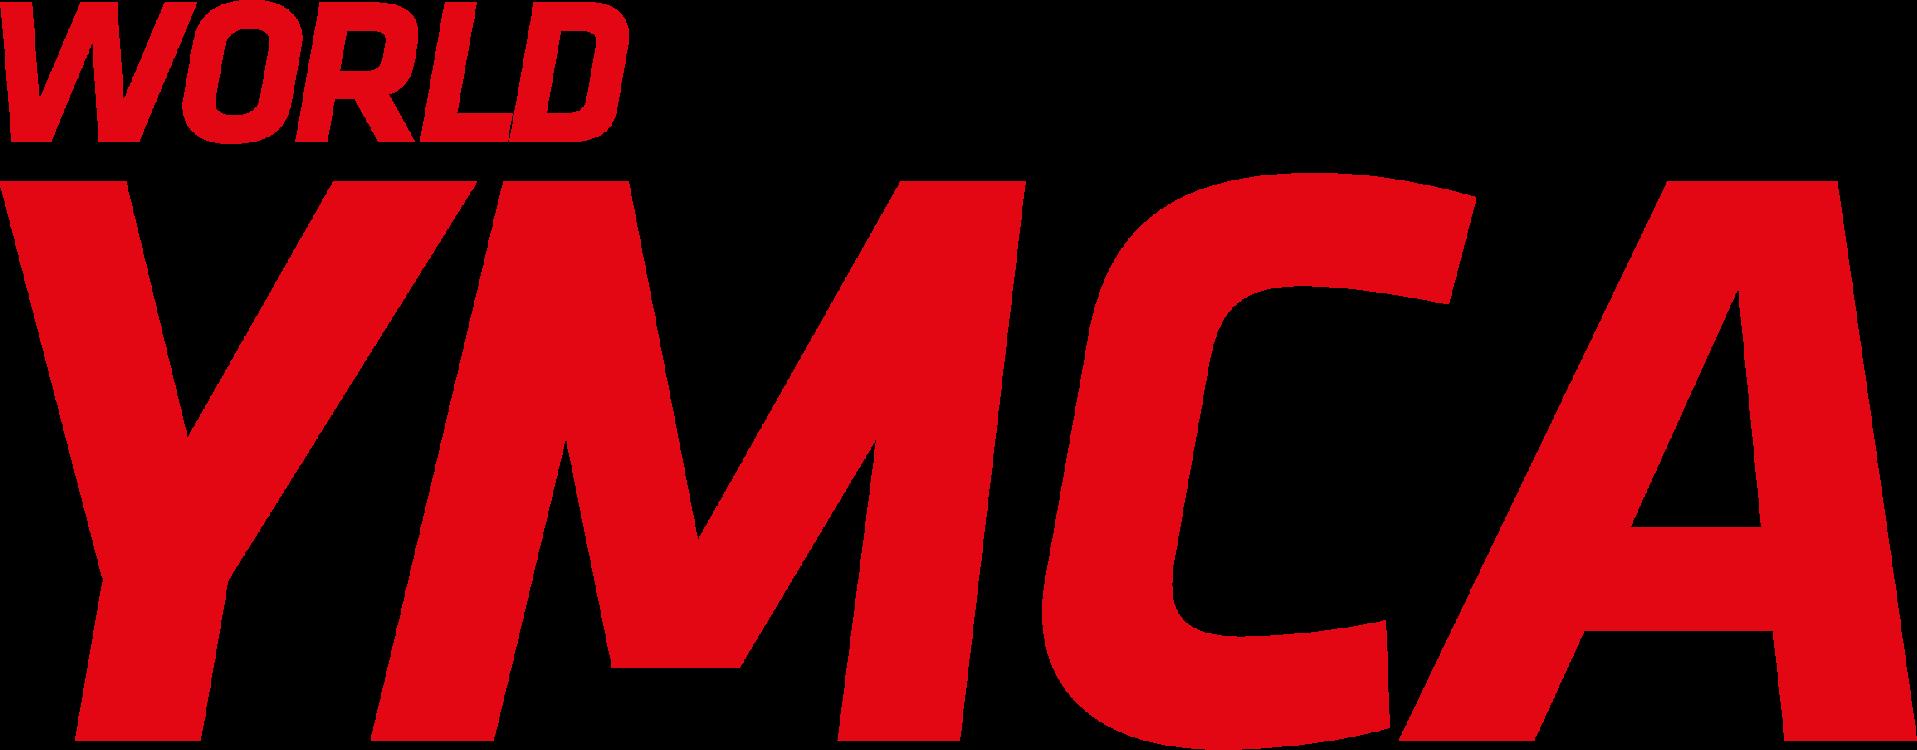 World YMCA logo.png